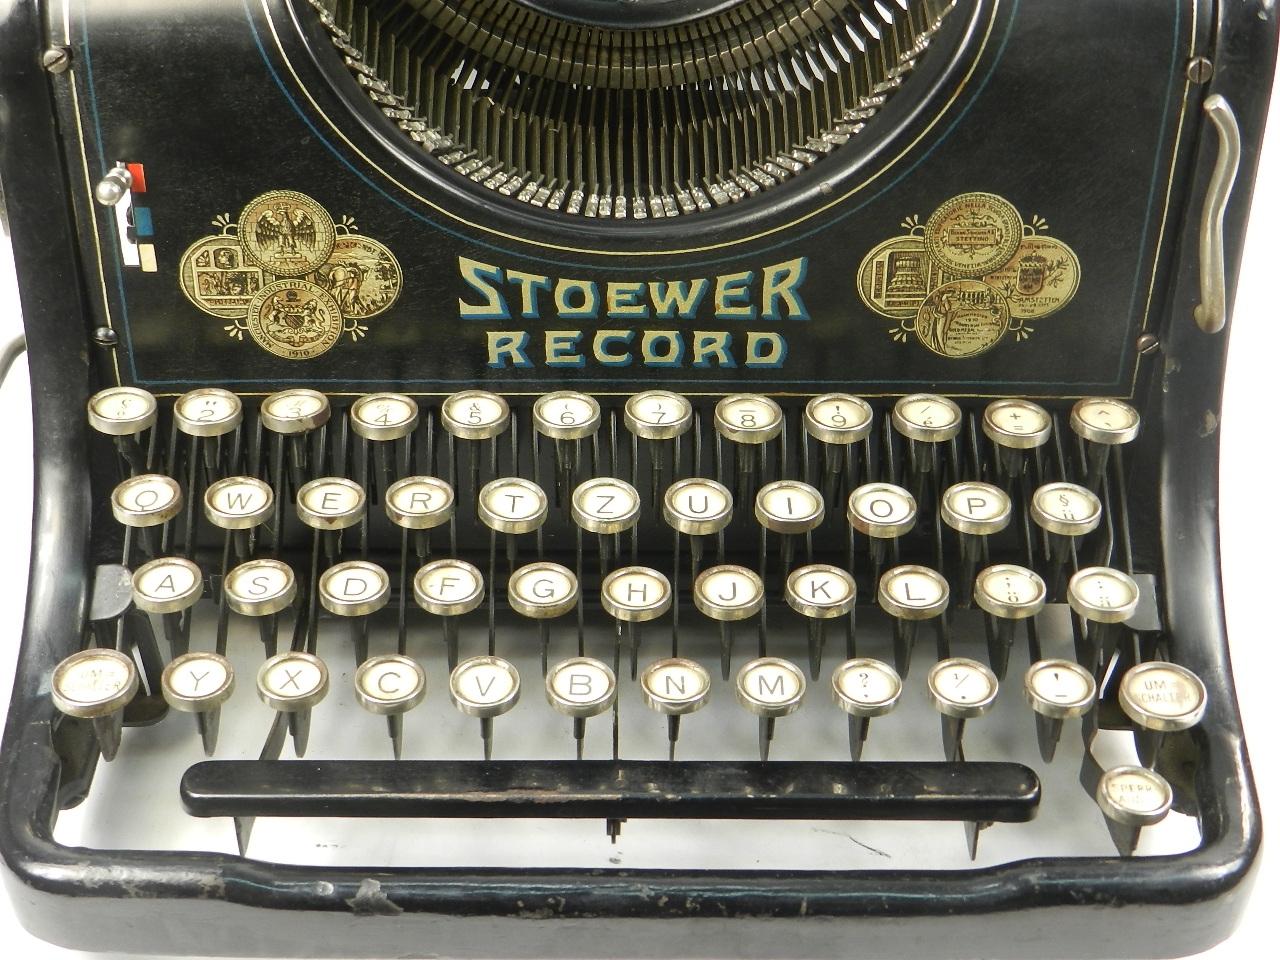 Imagen STOEWER RECORD AÑO 1910 27372